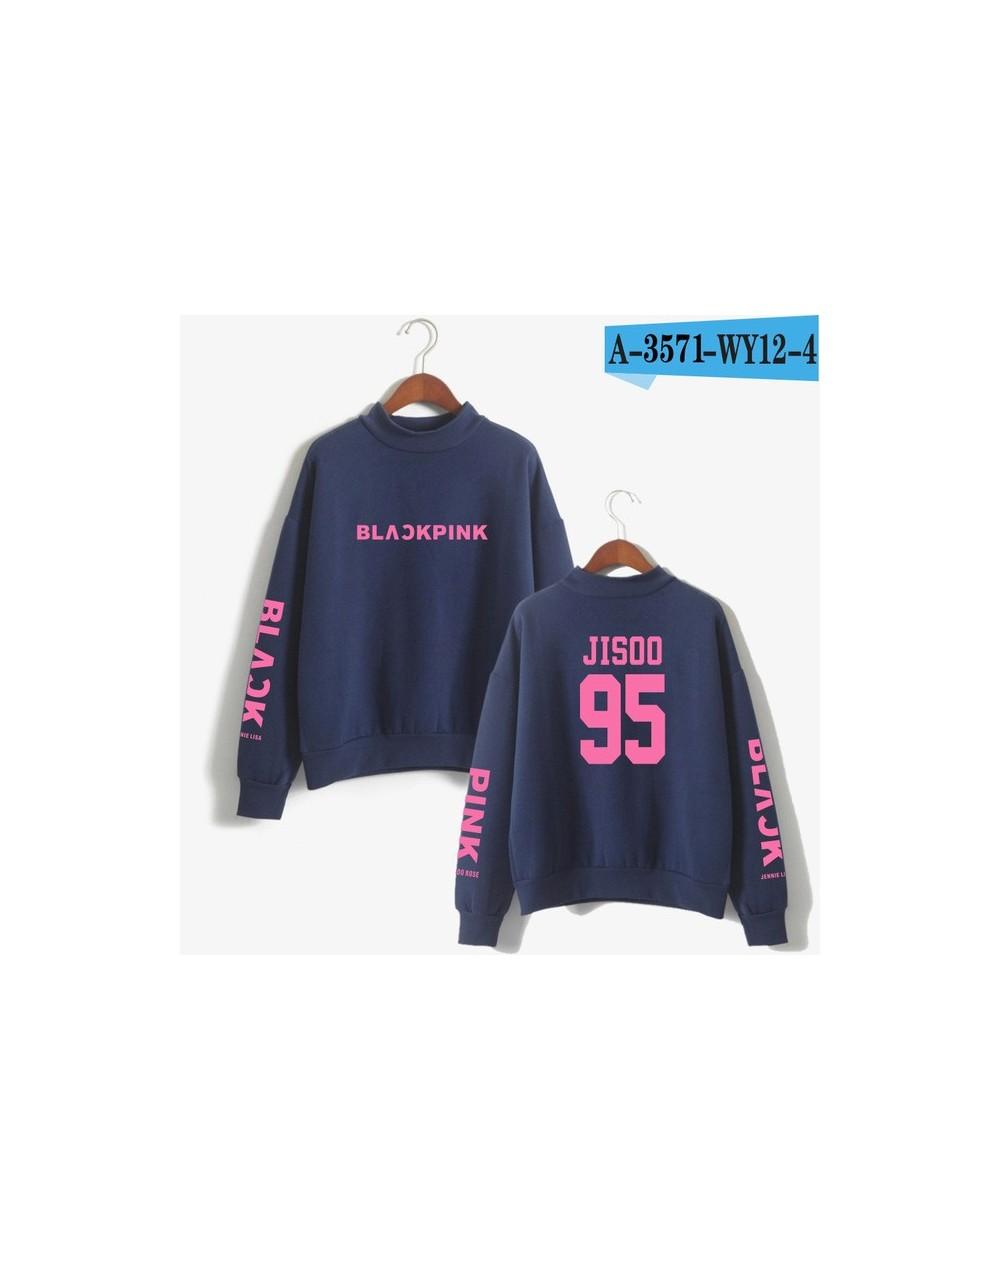 2018 BLACKPINK Girl's Group Kpop cotton Oversize Turtlenecks Hoodies Sweatshirts Women tracksuit Casual Sweatshirts - Navy b...